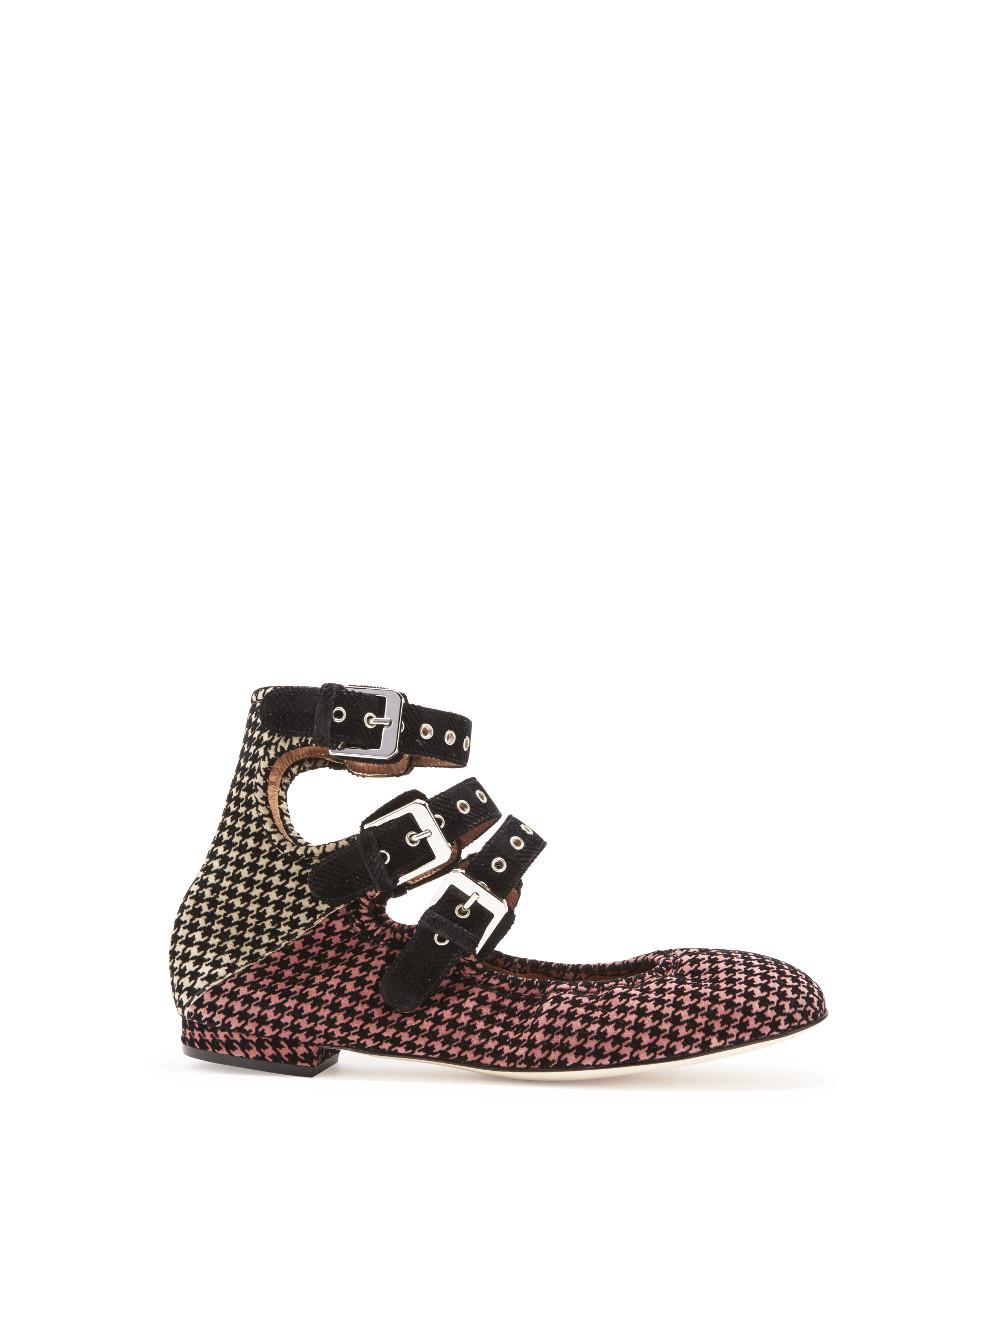 Chaussures Paule - Laurence Dacade